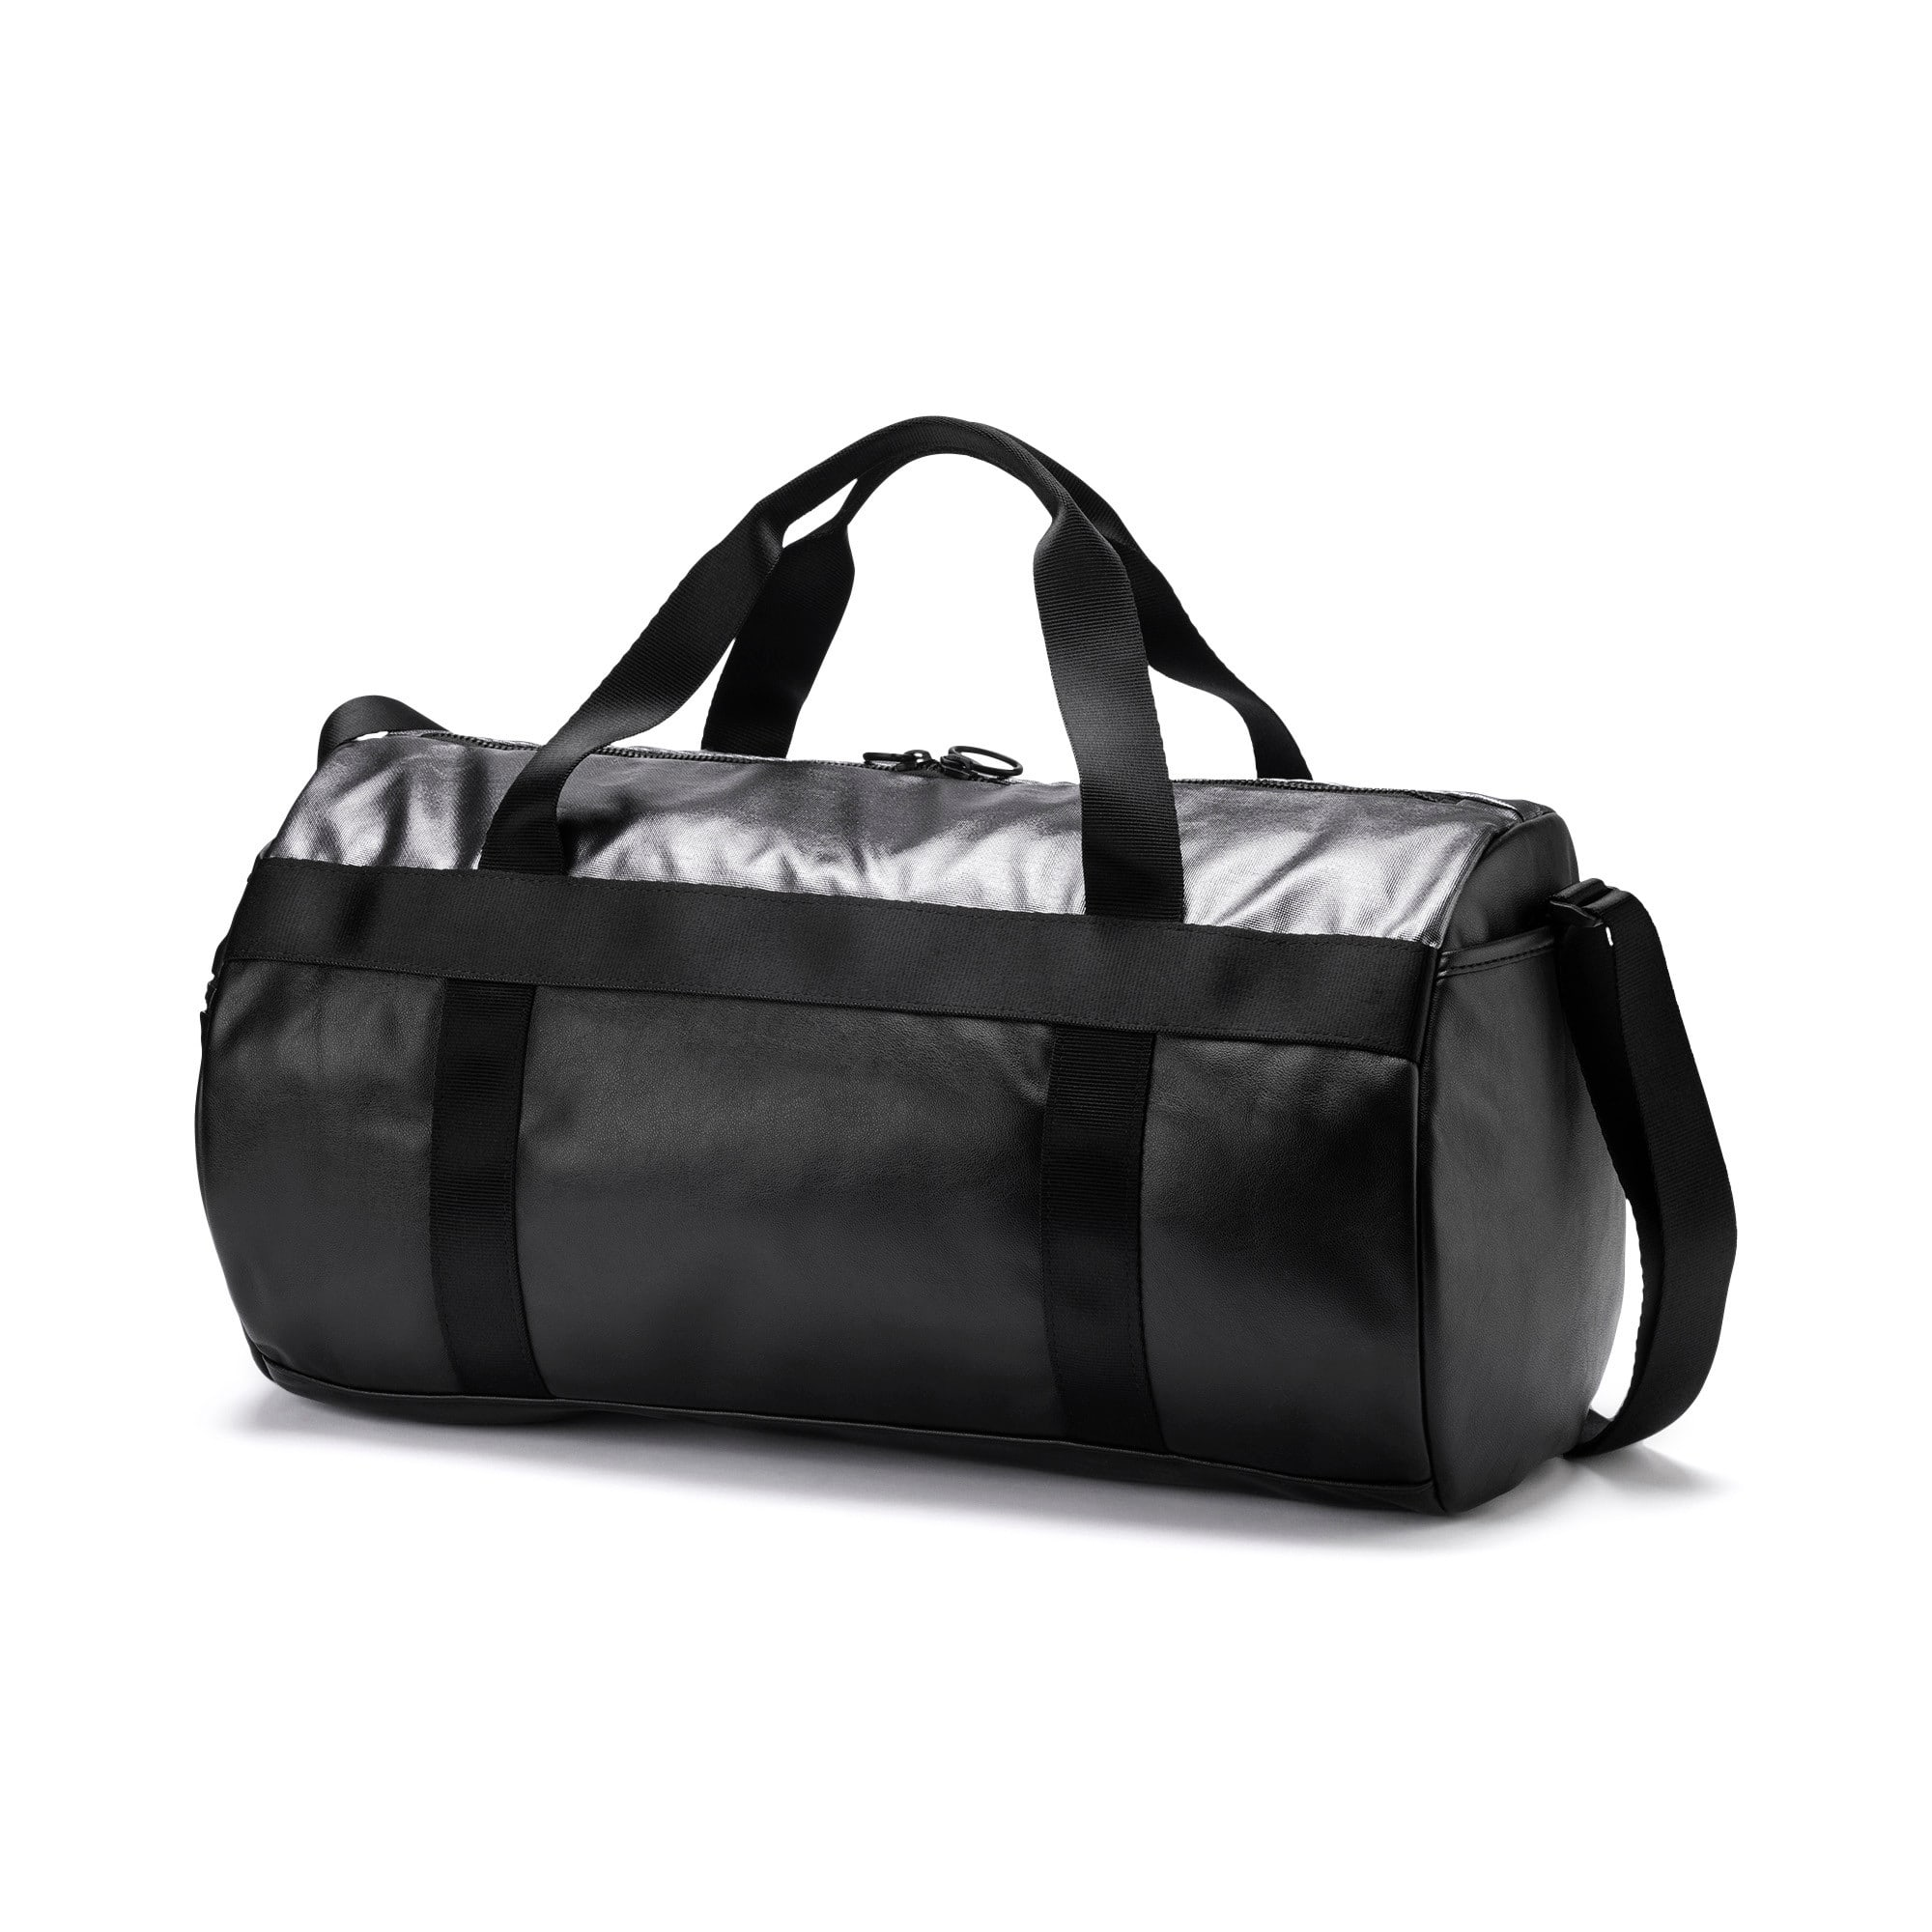 Thumbnail 2 of SG x PUMA Style Barrel Bag, Puma Black, medium